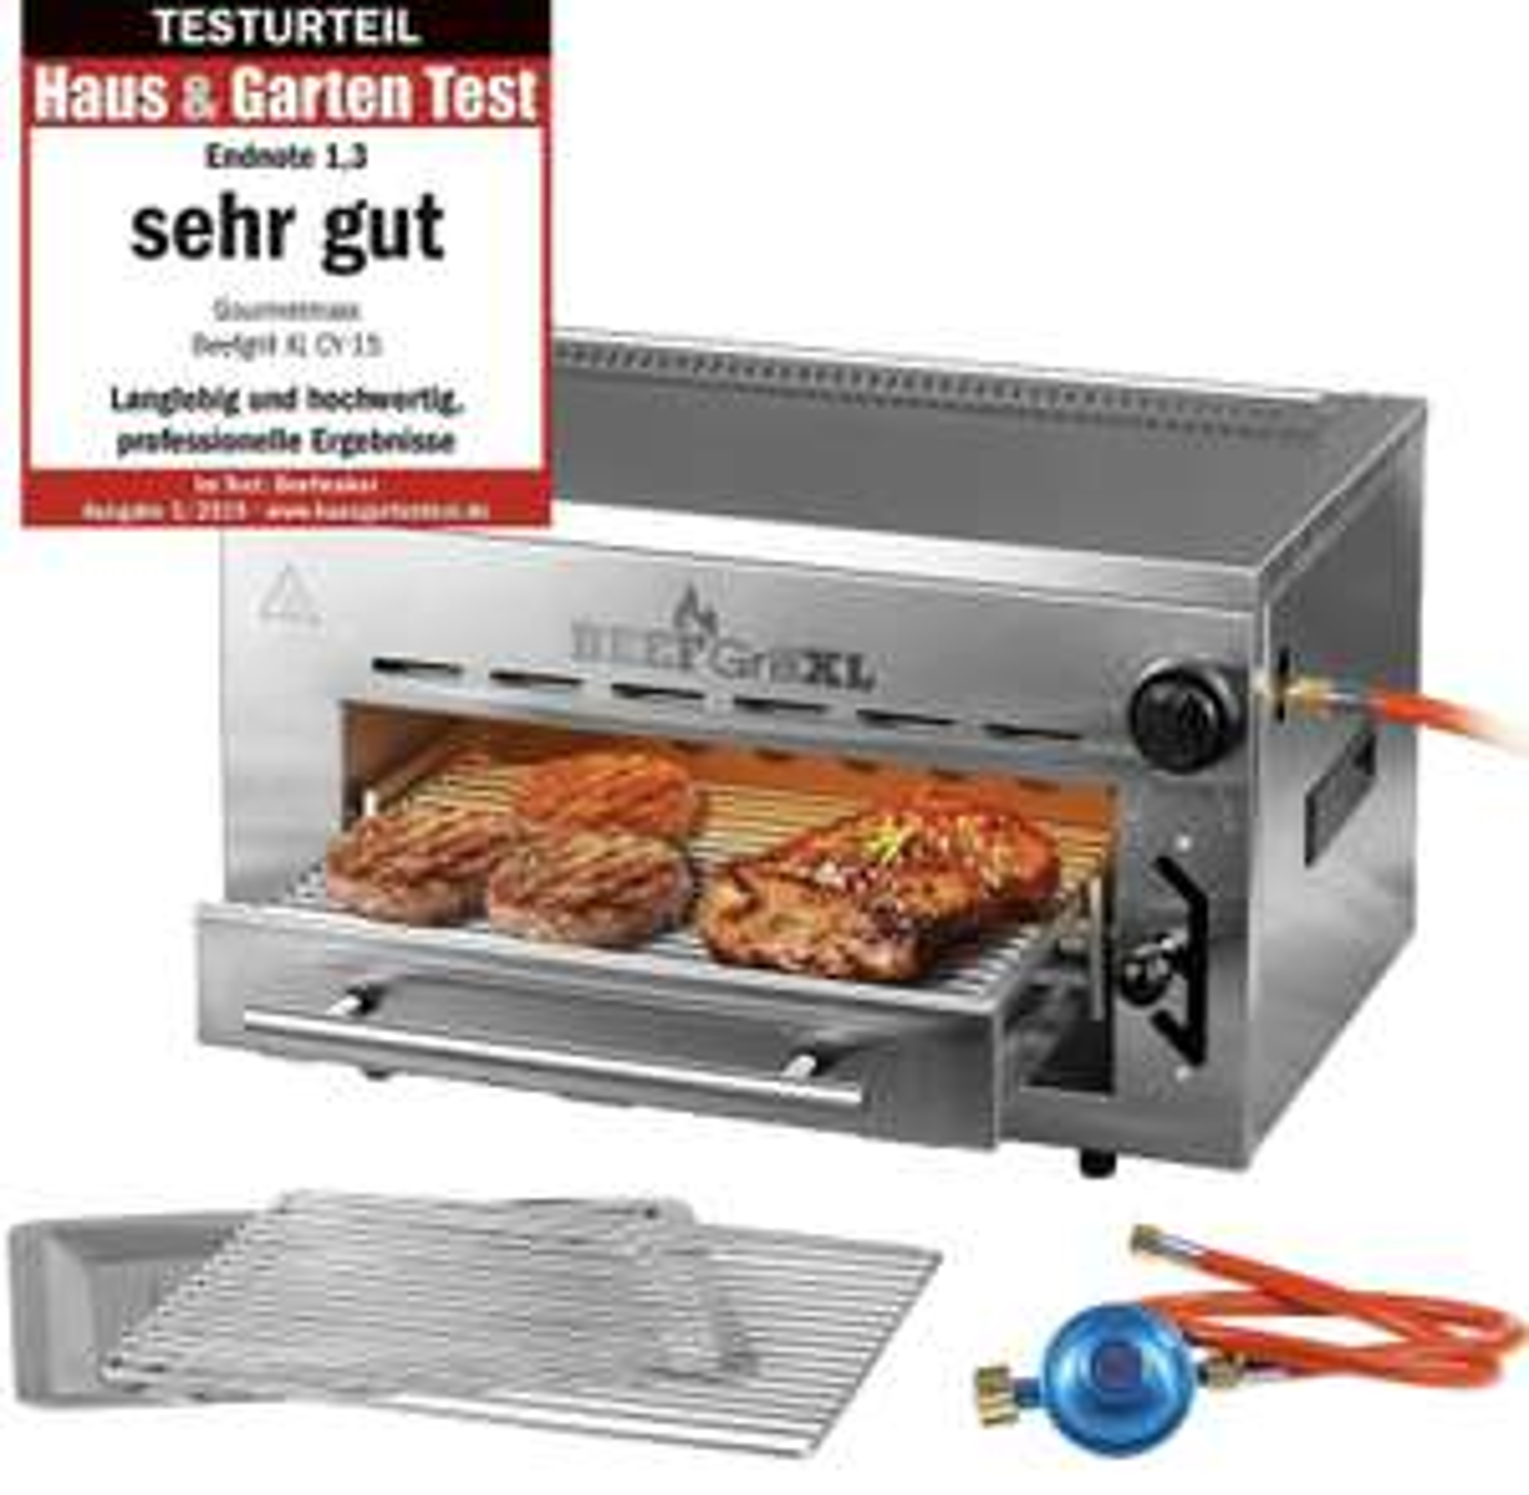 Beef Grill XL Hochtemperaturgrill Oberhitzegrill Gasgrill BBQ 800° Edelstahl für 89,99€ inkl. Versandkosten